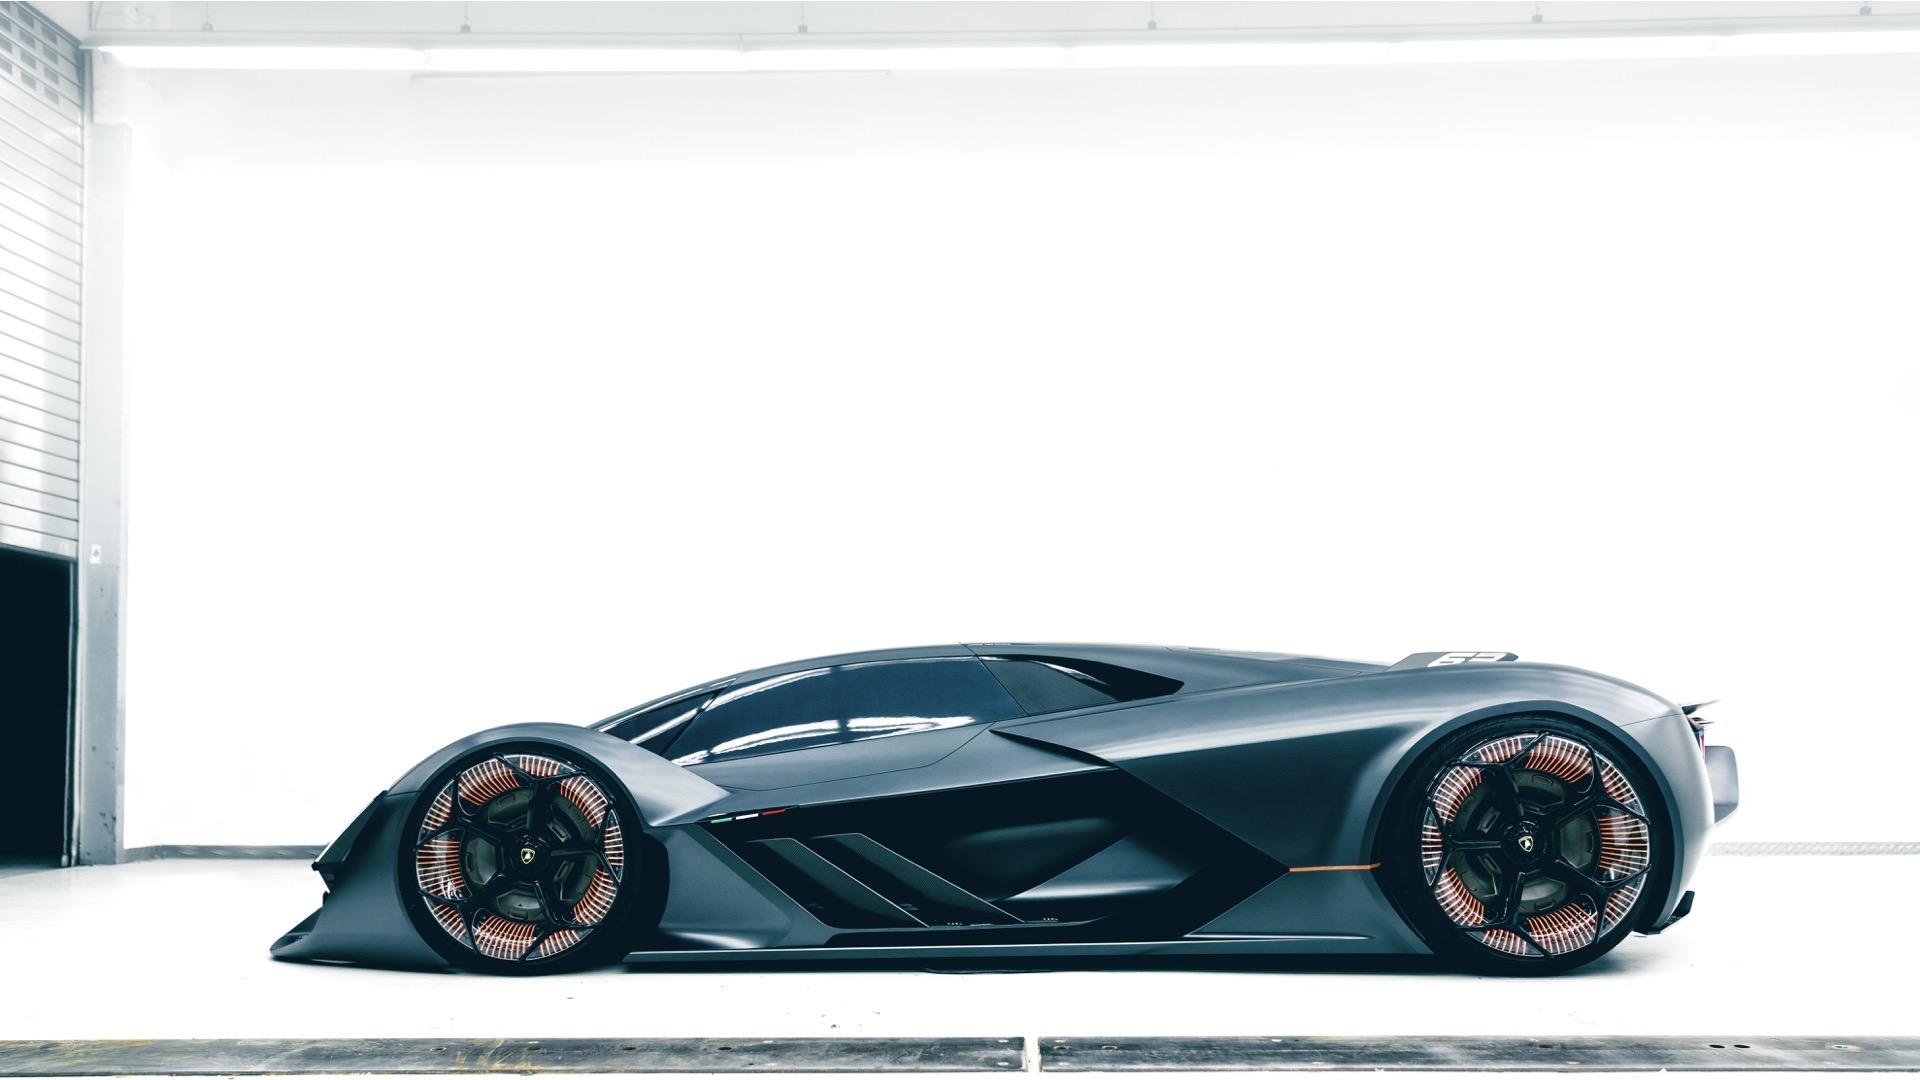 General 1920x1080 Lamborghini Terzo Millenio car Lamborghini Hypercar concept cars